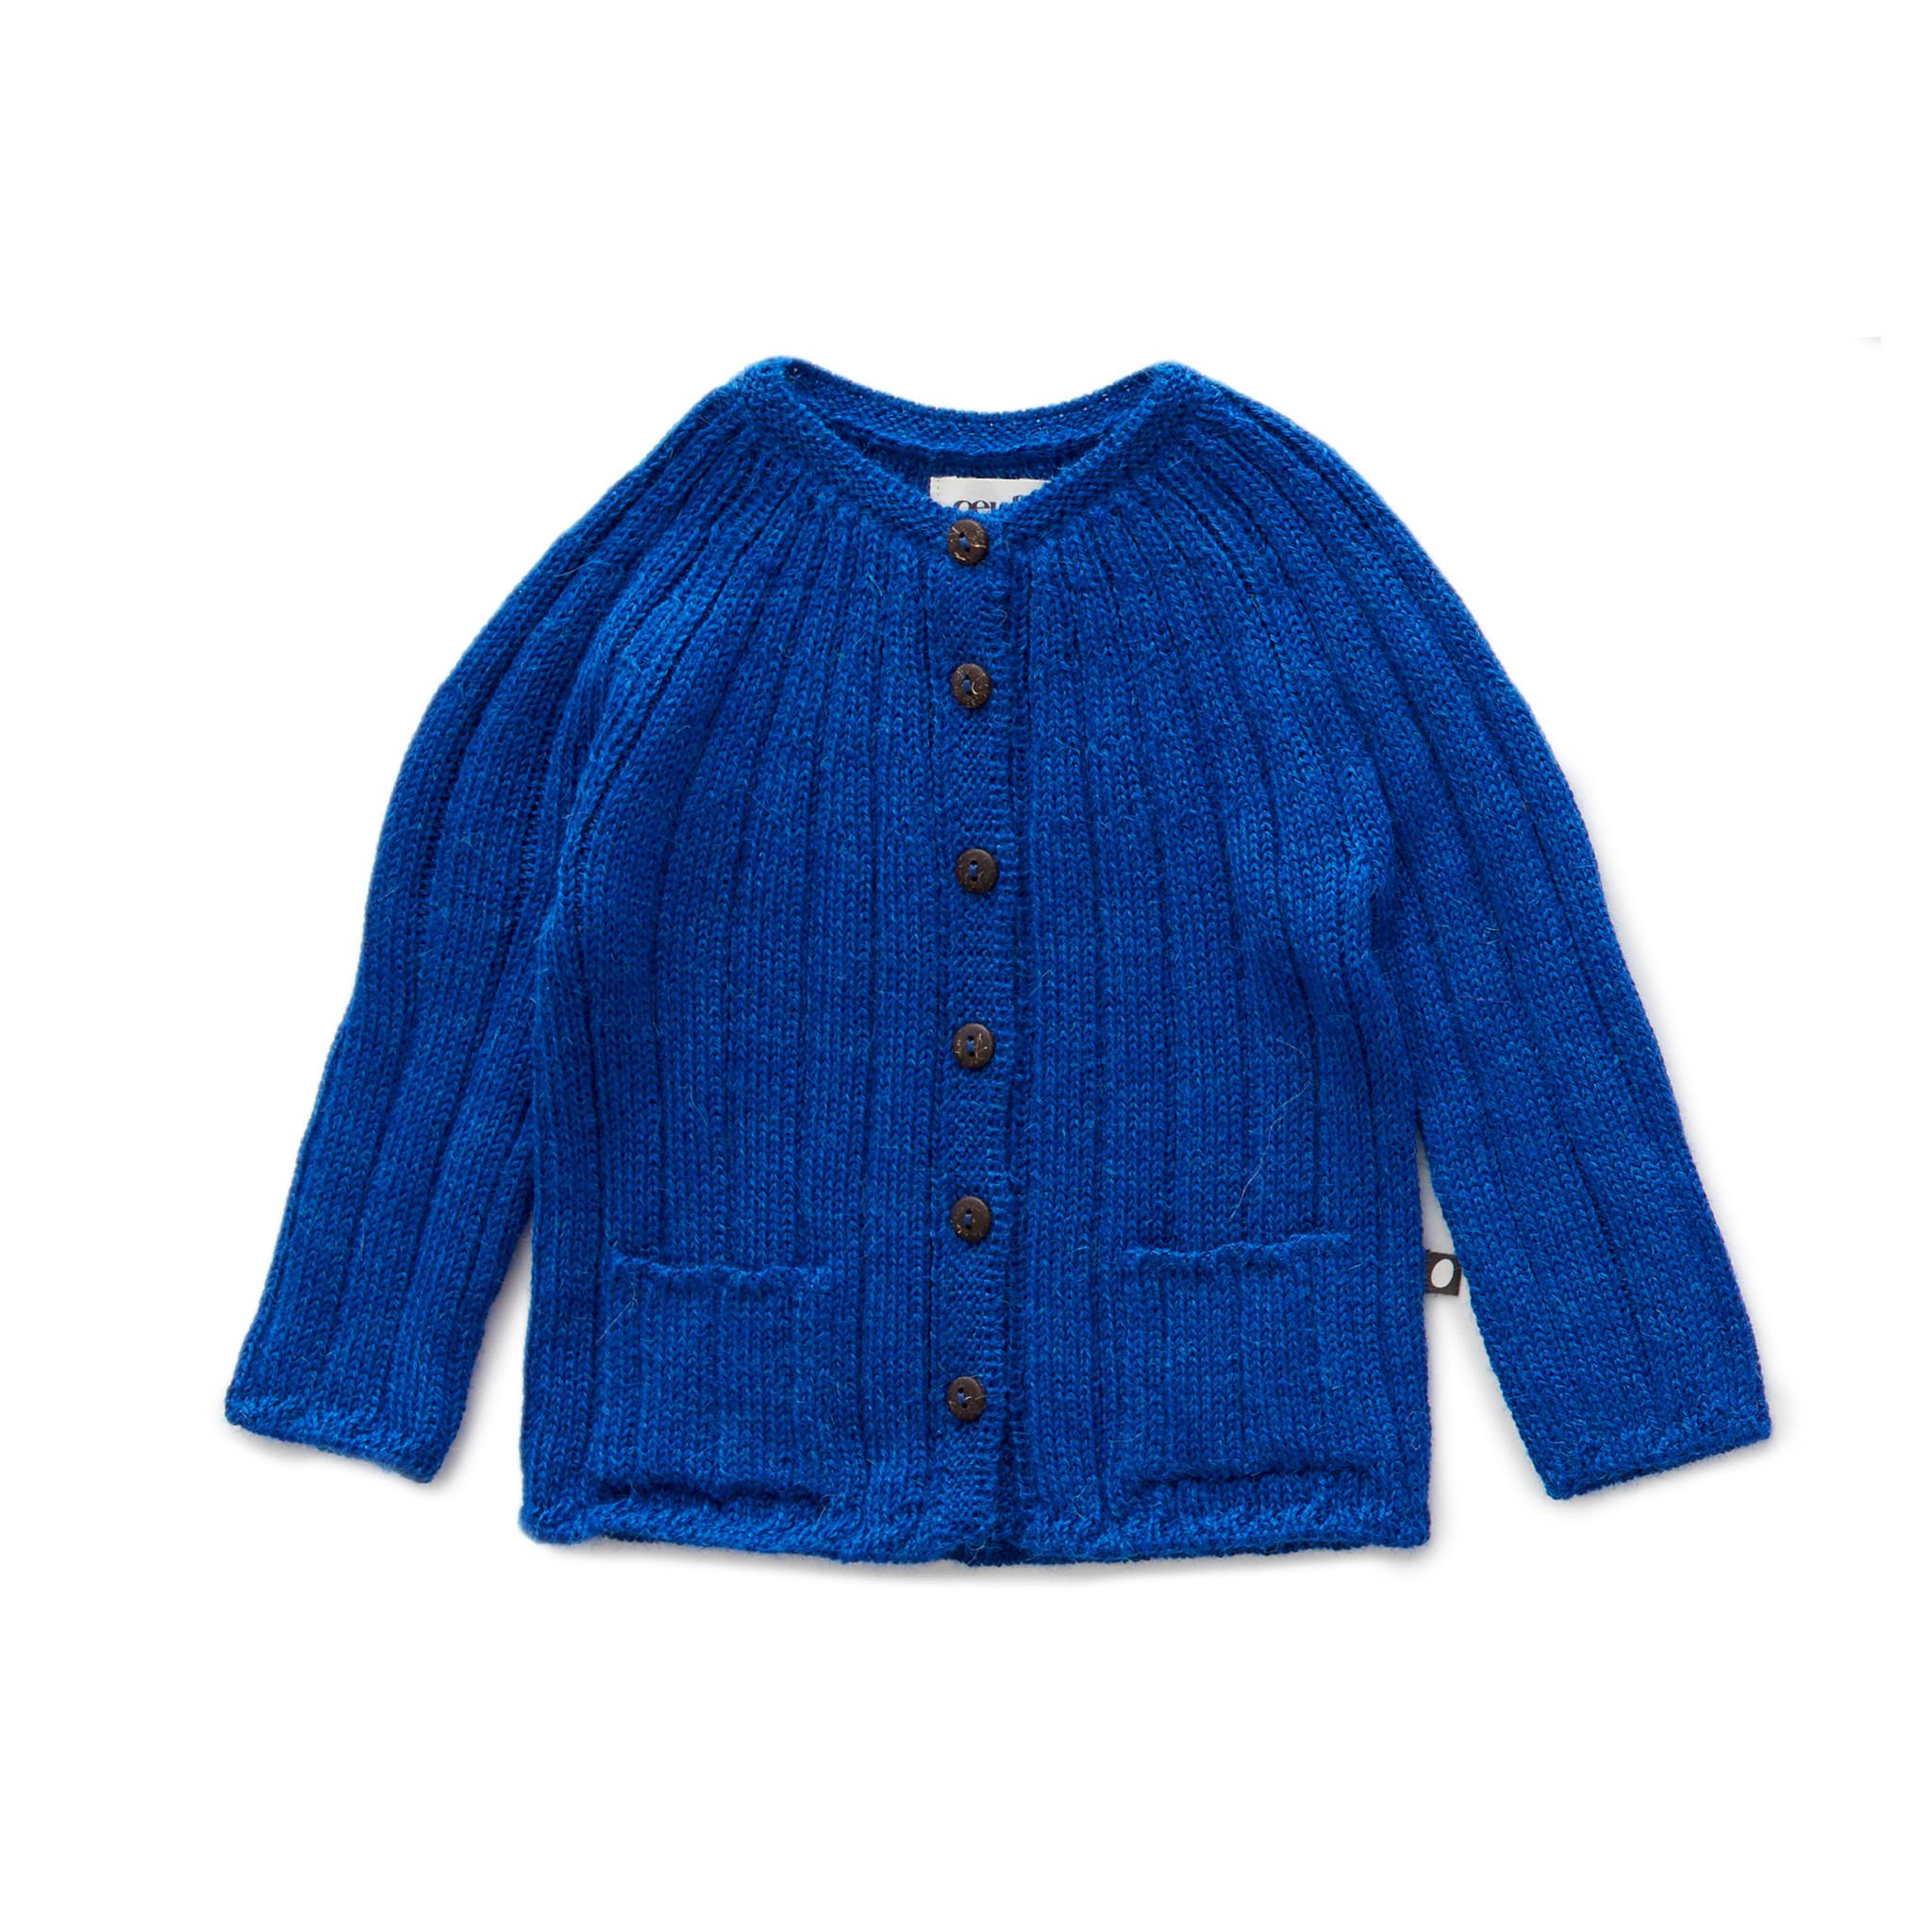 Oeuf Blue Ribbed Cardigan